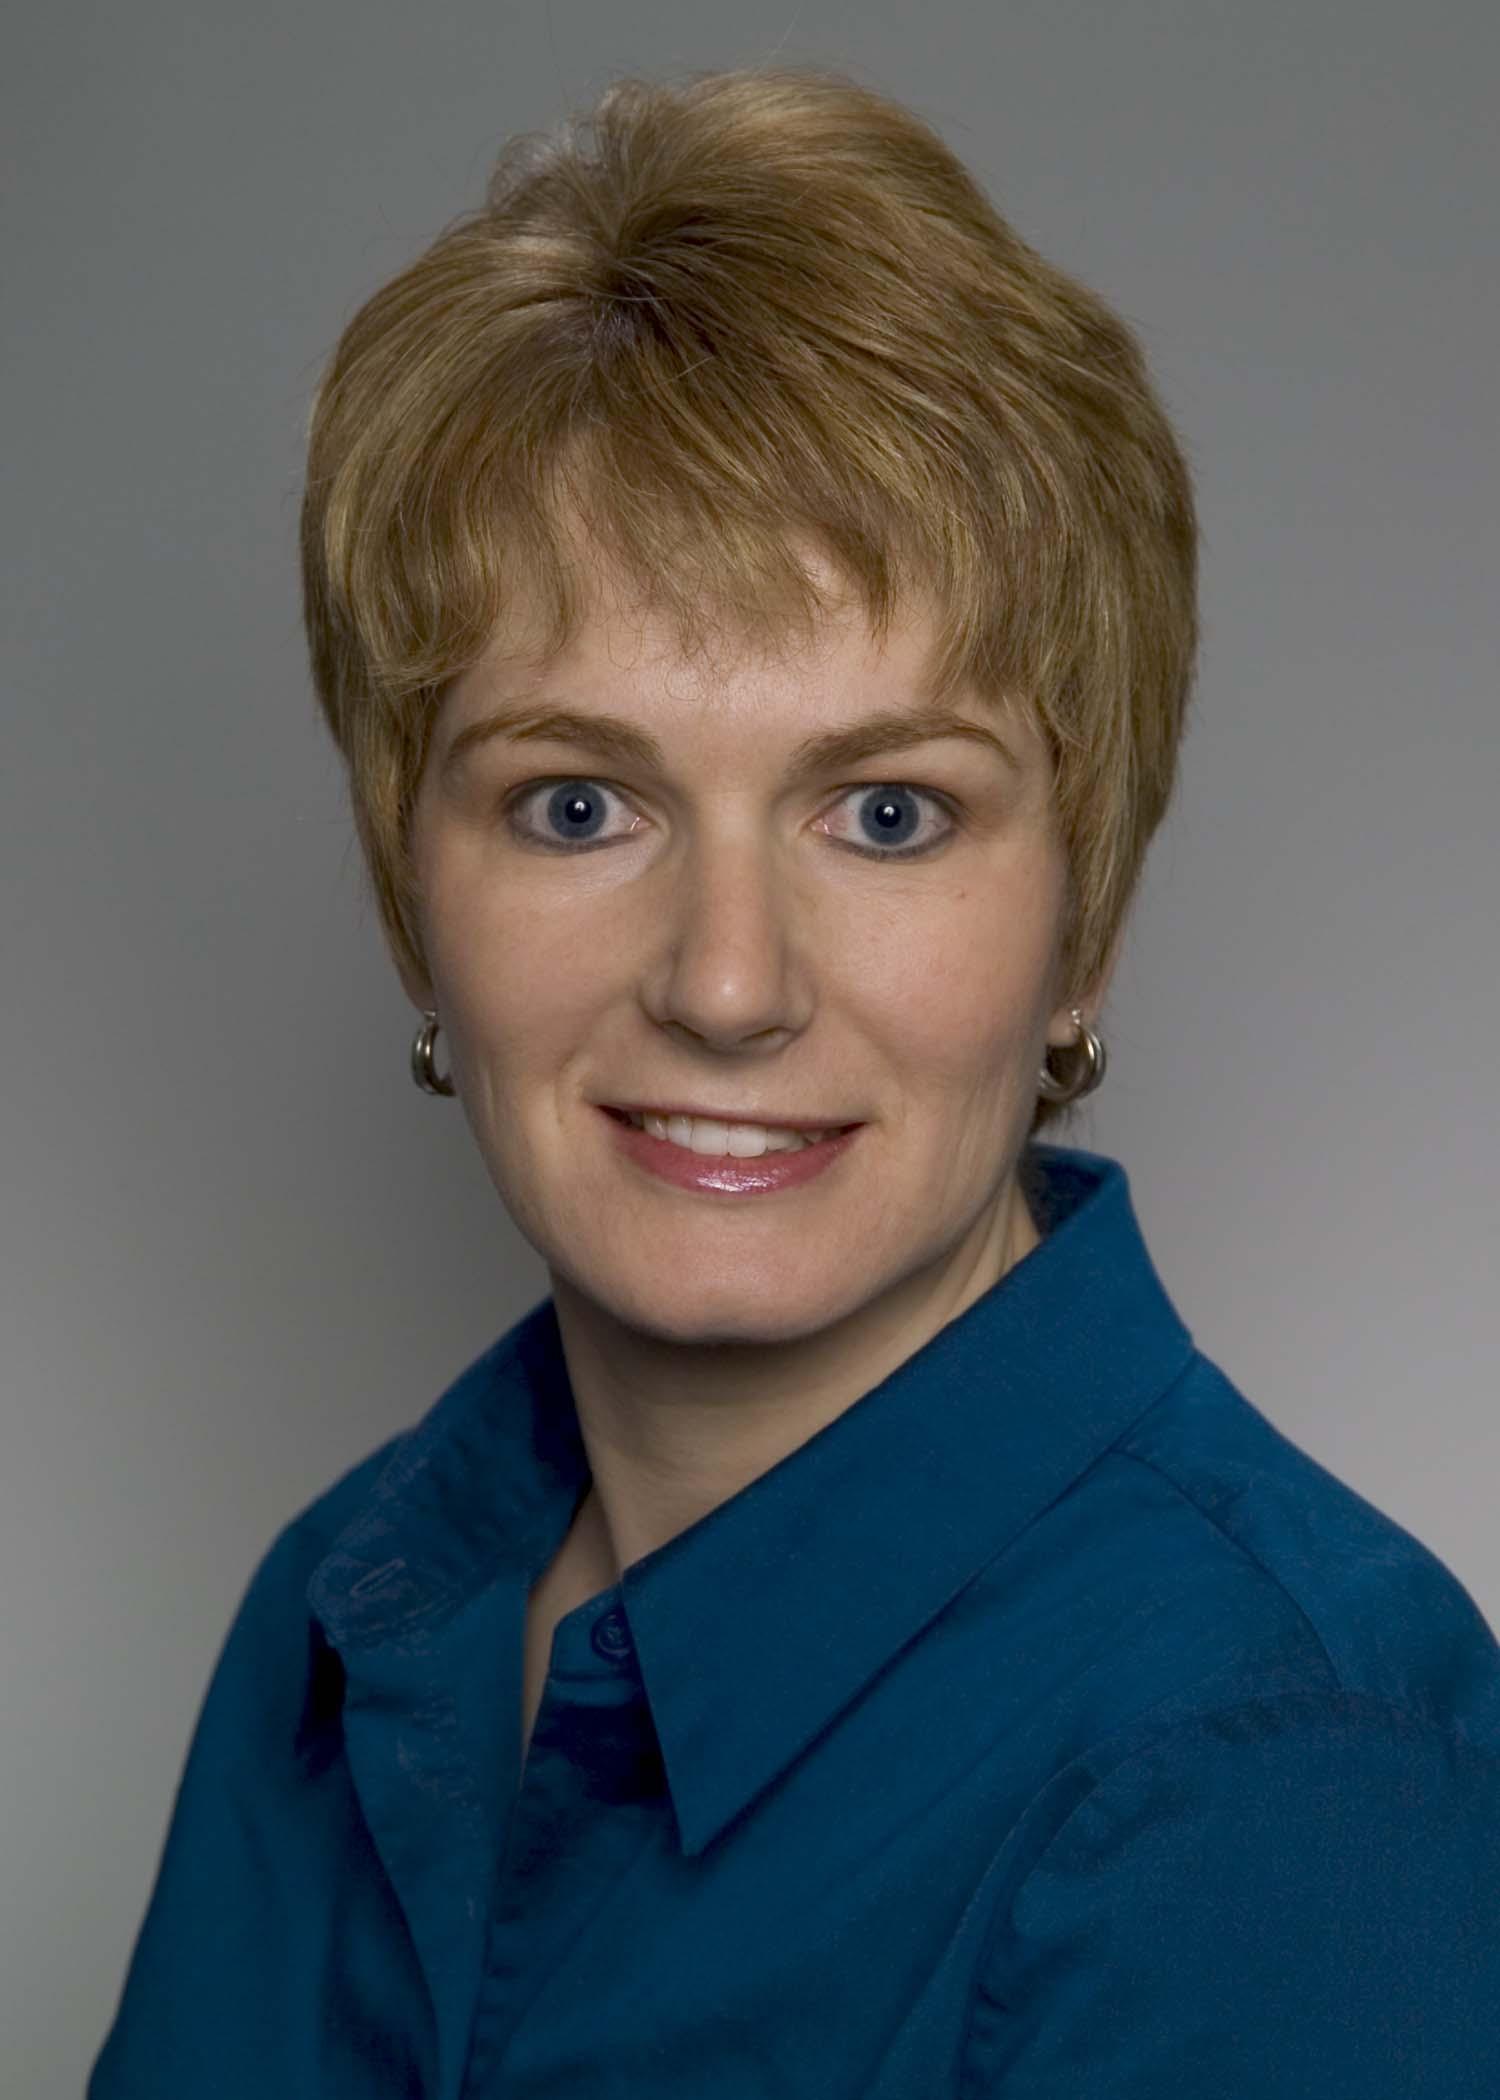 Kelly Scheu, Clinical Research Nurse at MSKCC